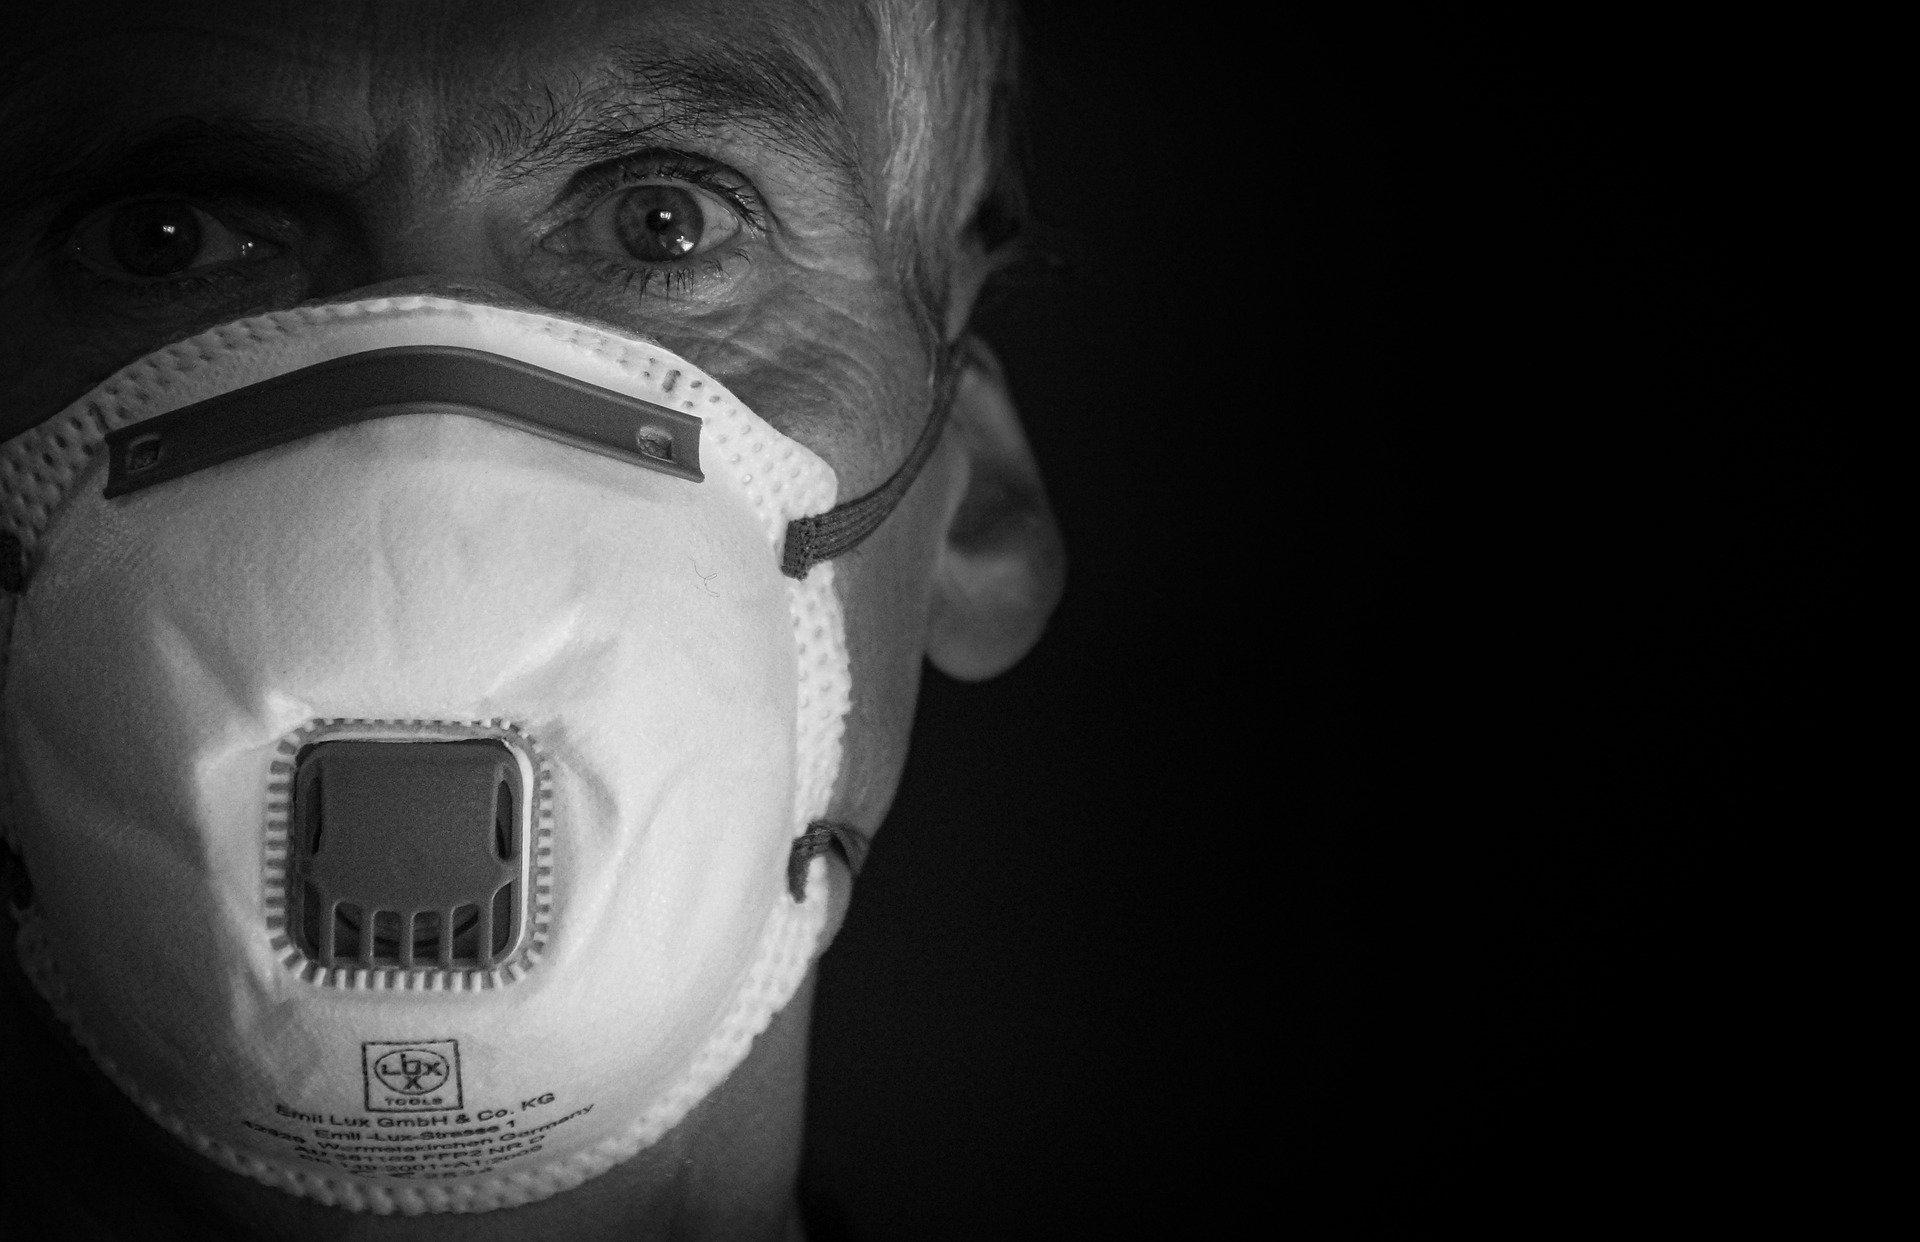 maschera corona virus